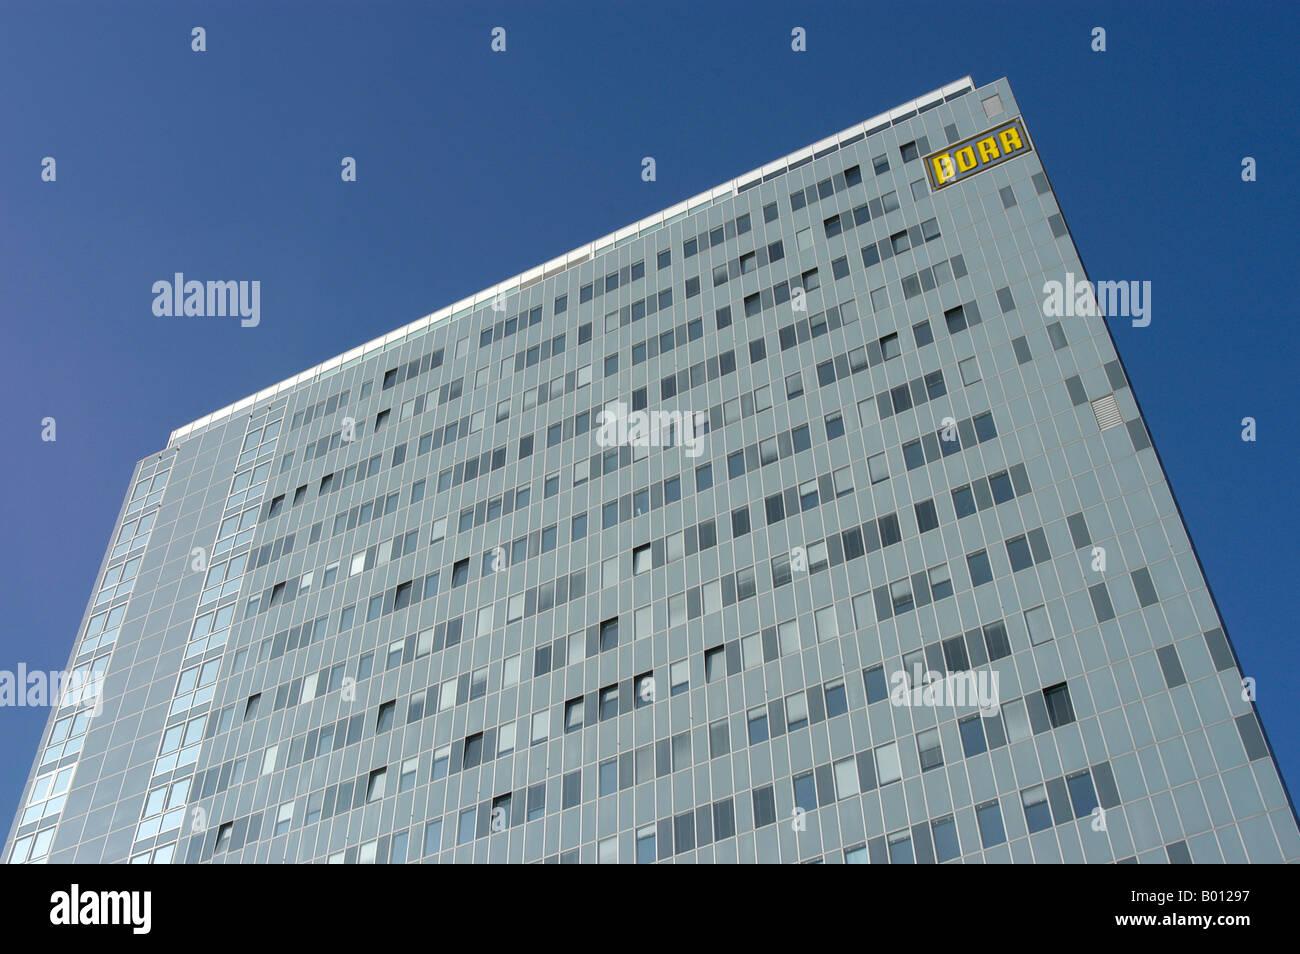 Zentrale - Stock Image